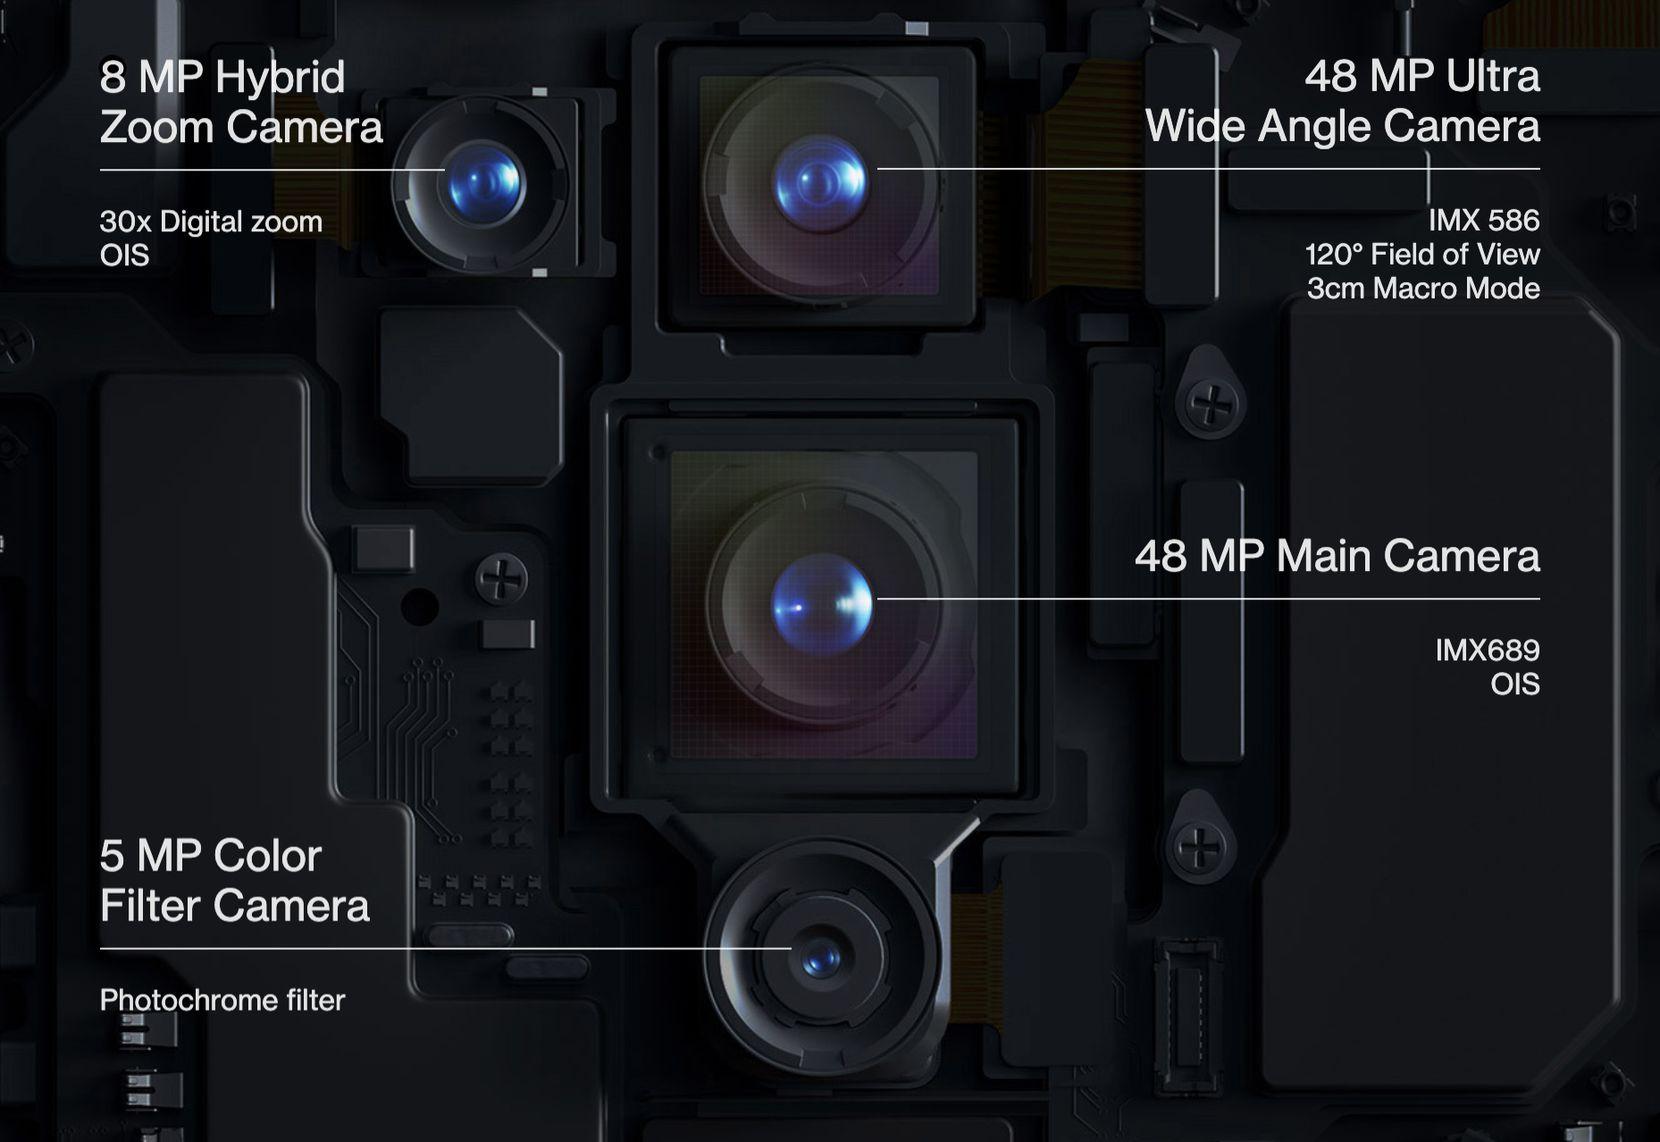 Camera internals of the OnePlus 8 Pro.